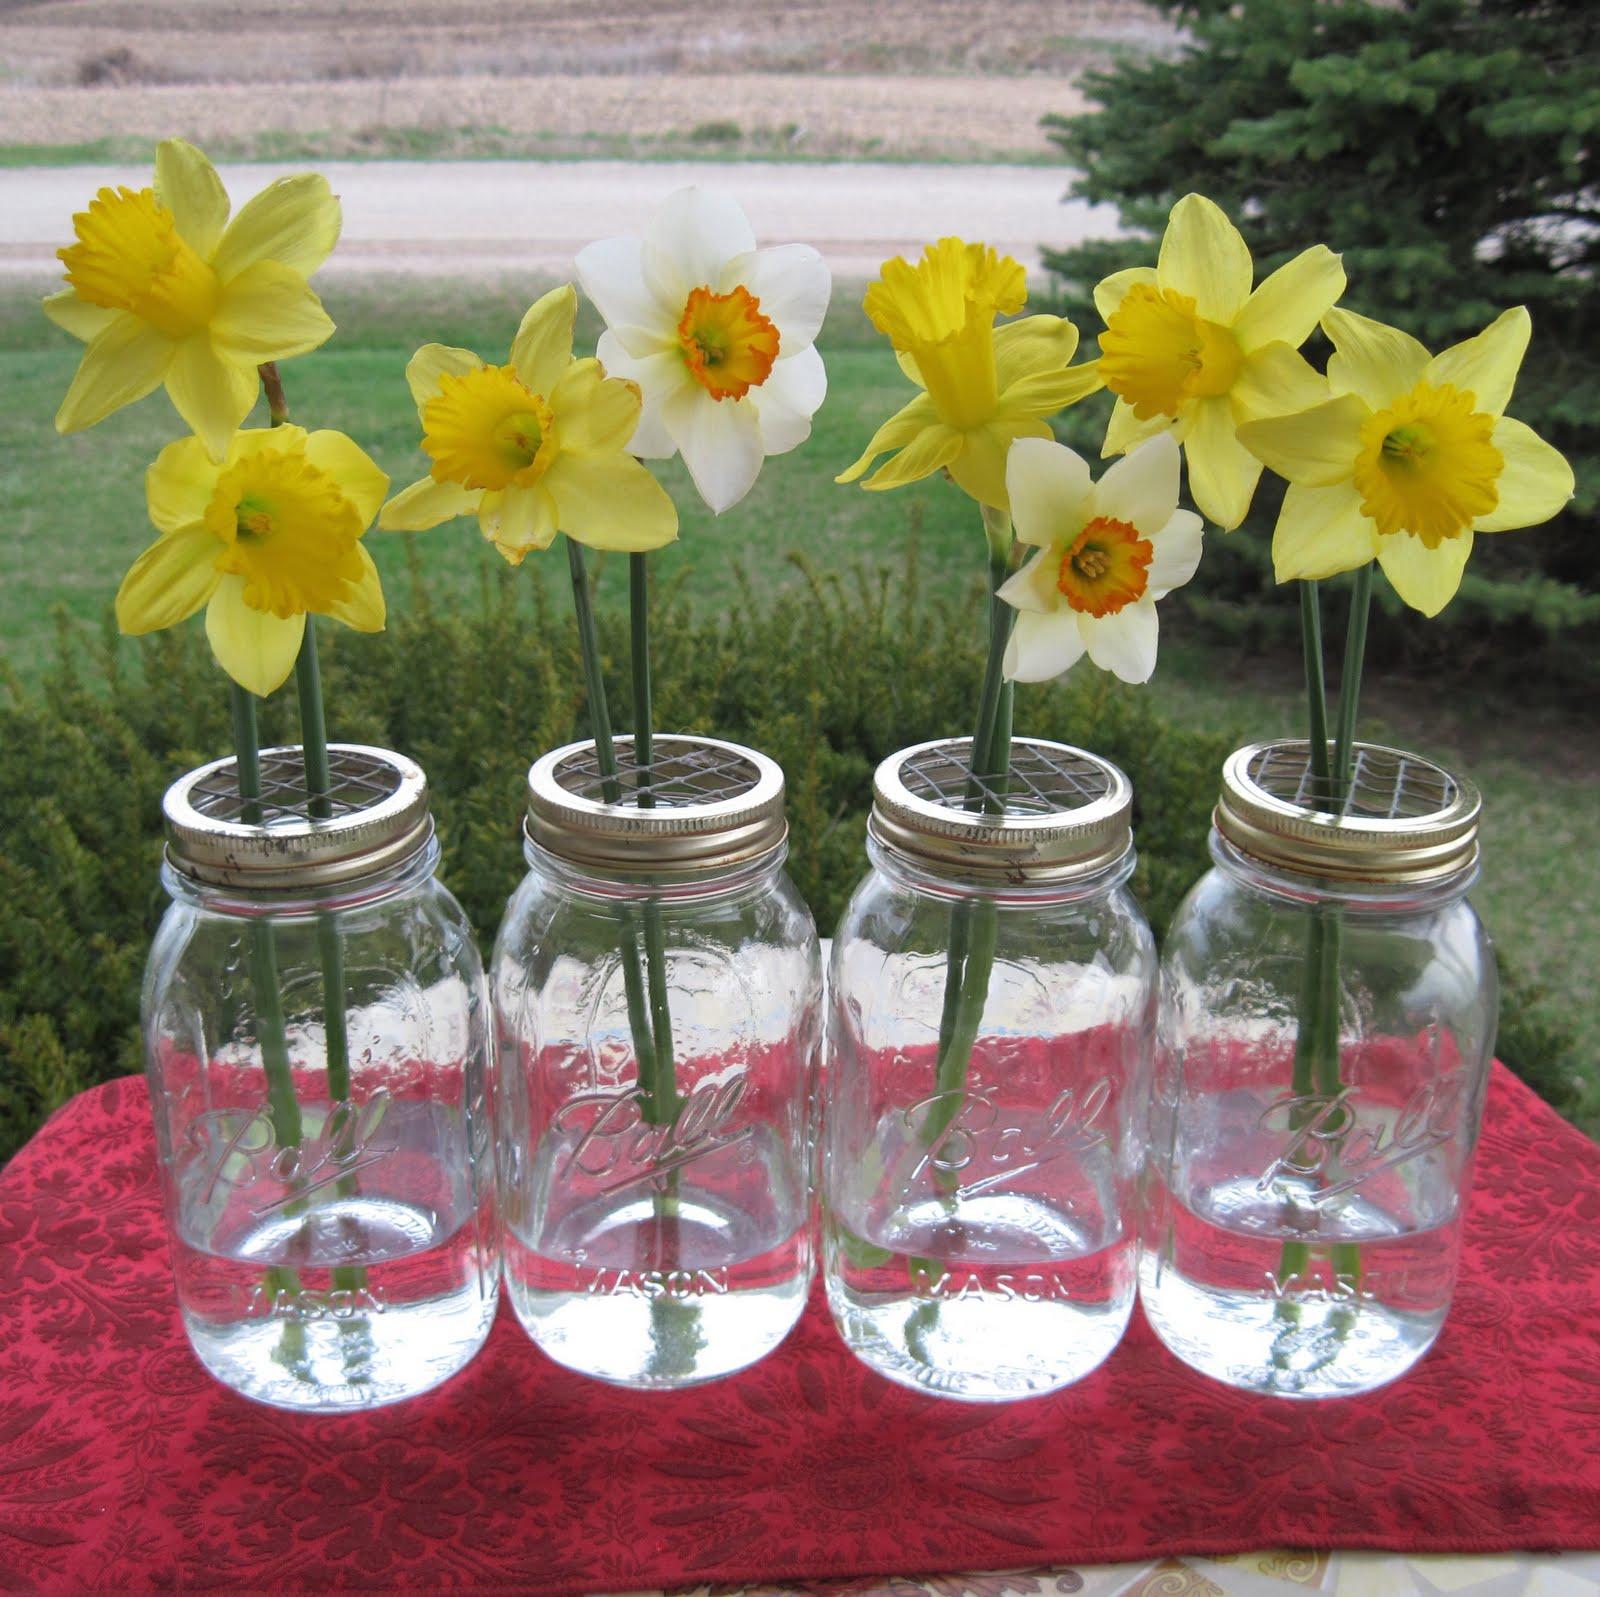 Mason Jar Wedding Reception Ideas: Hearts & Flowers: Decorating For Your Wedding Day: April 2010